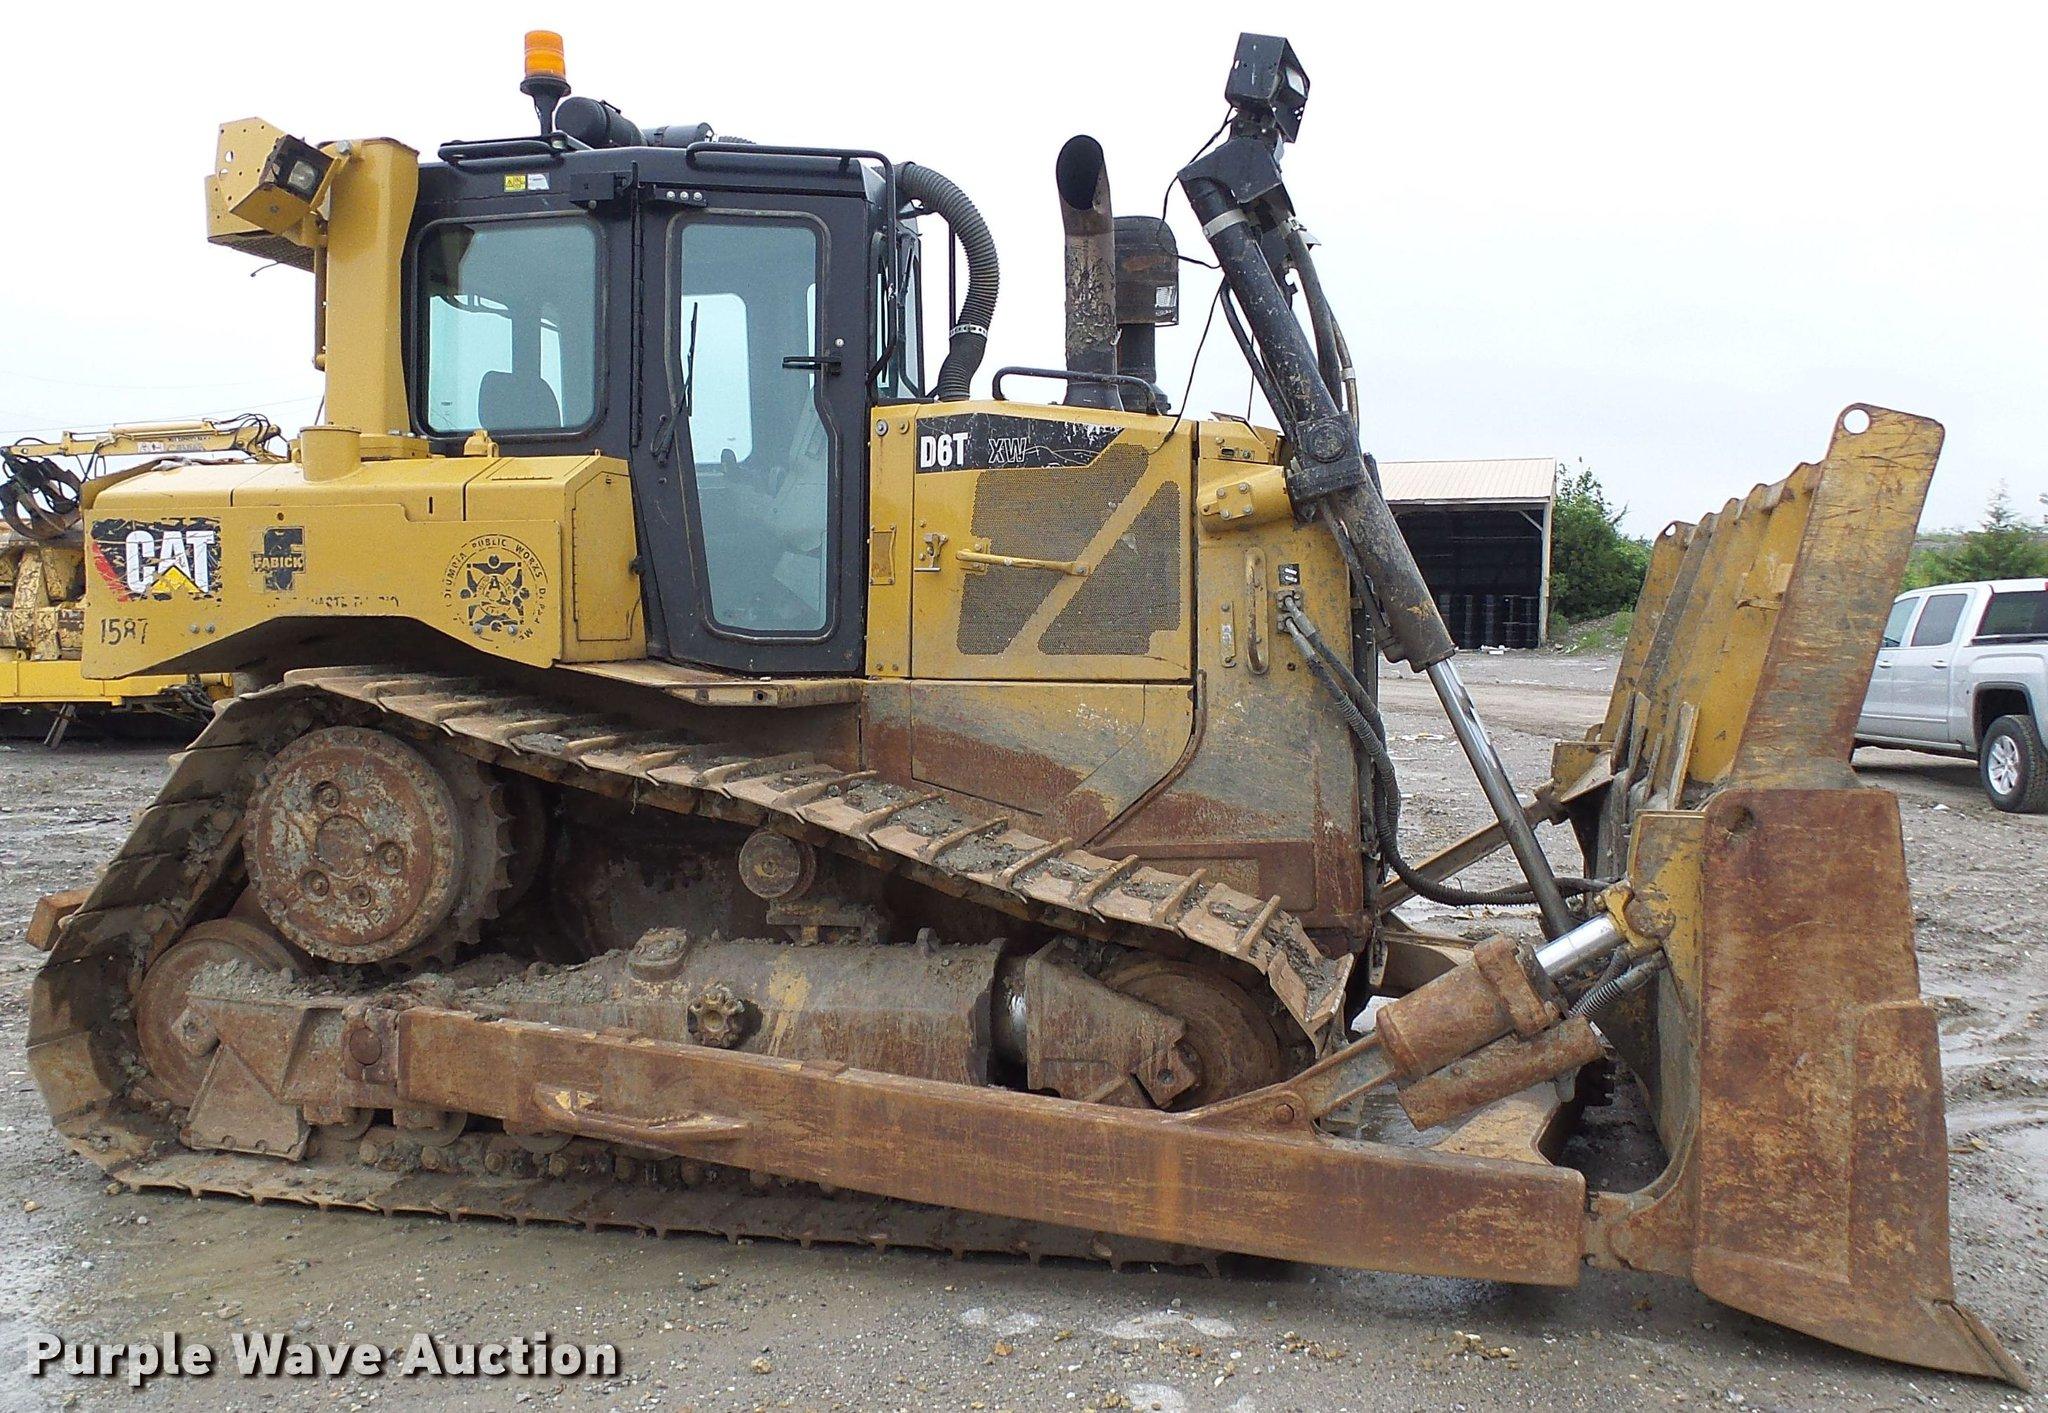 2012 Caterpillar D6T XW dozer | Item DF7299 | Thursday June